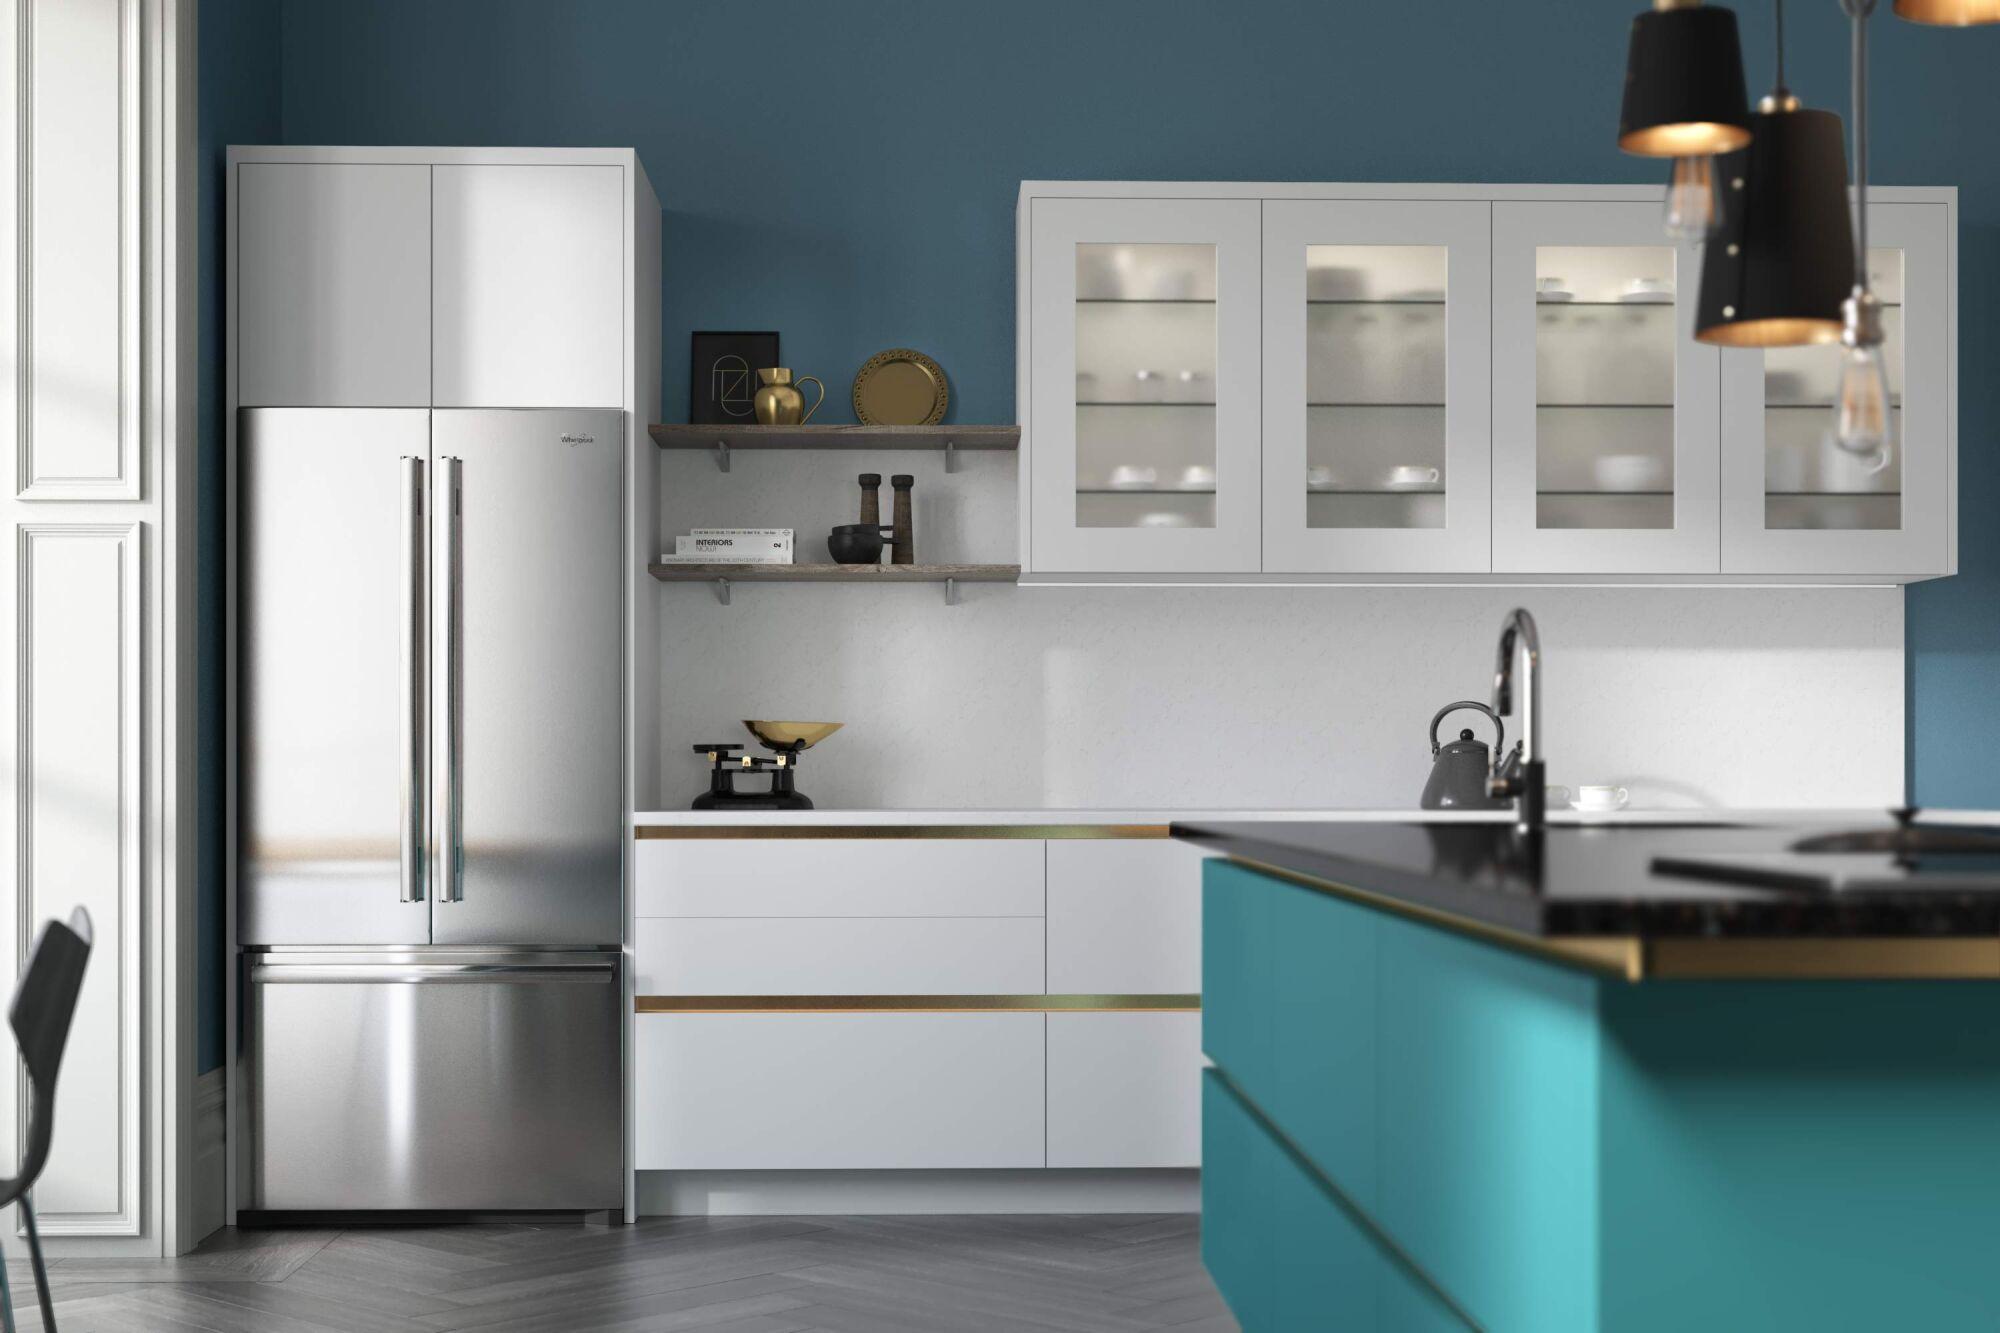 Milano Ultra Kitchen in Chalk White